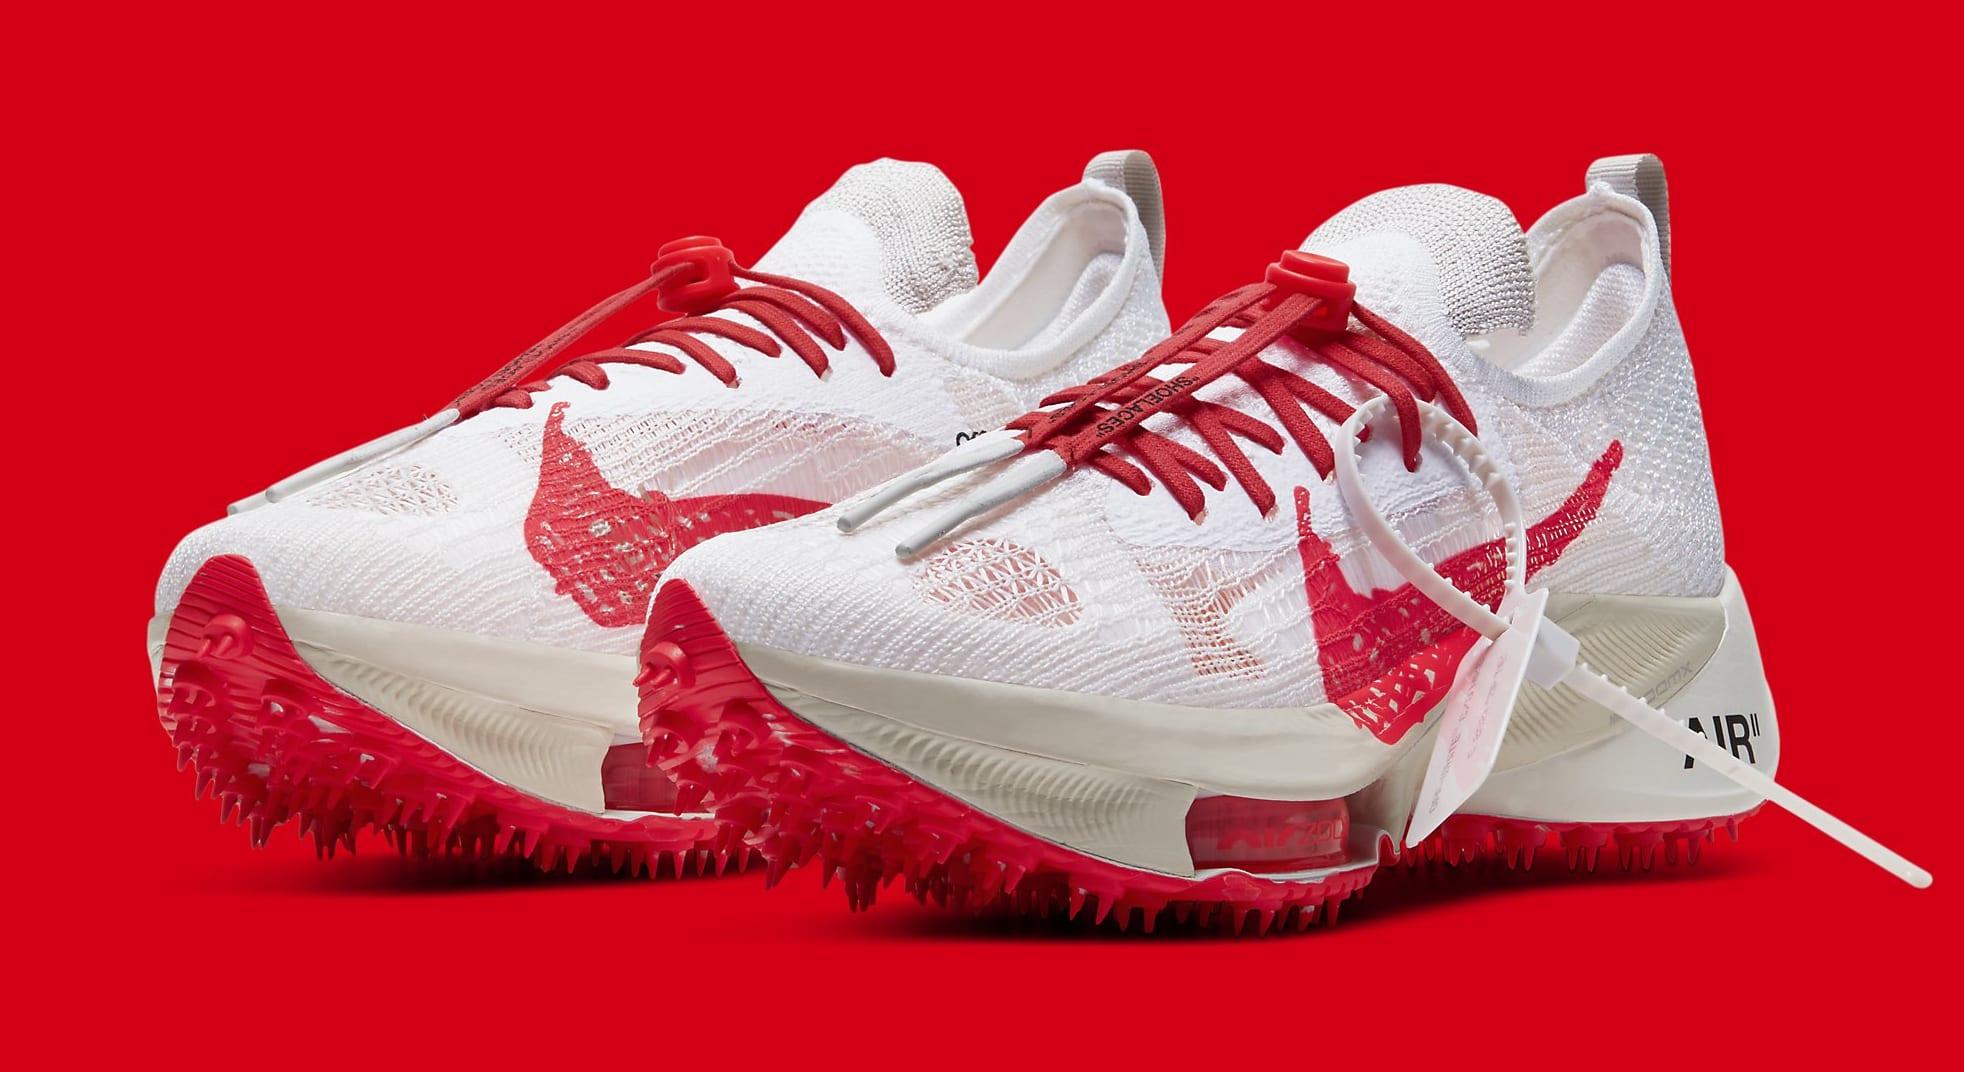 Off-White x Nike Air Zoom Tempo Next% CV0697-100 Pair